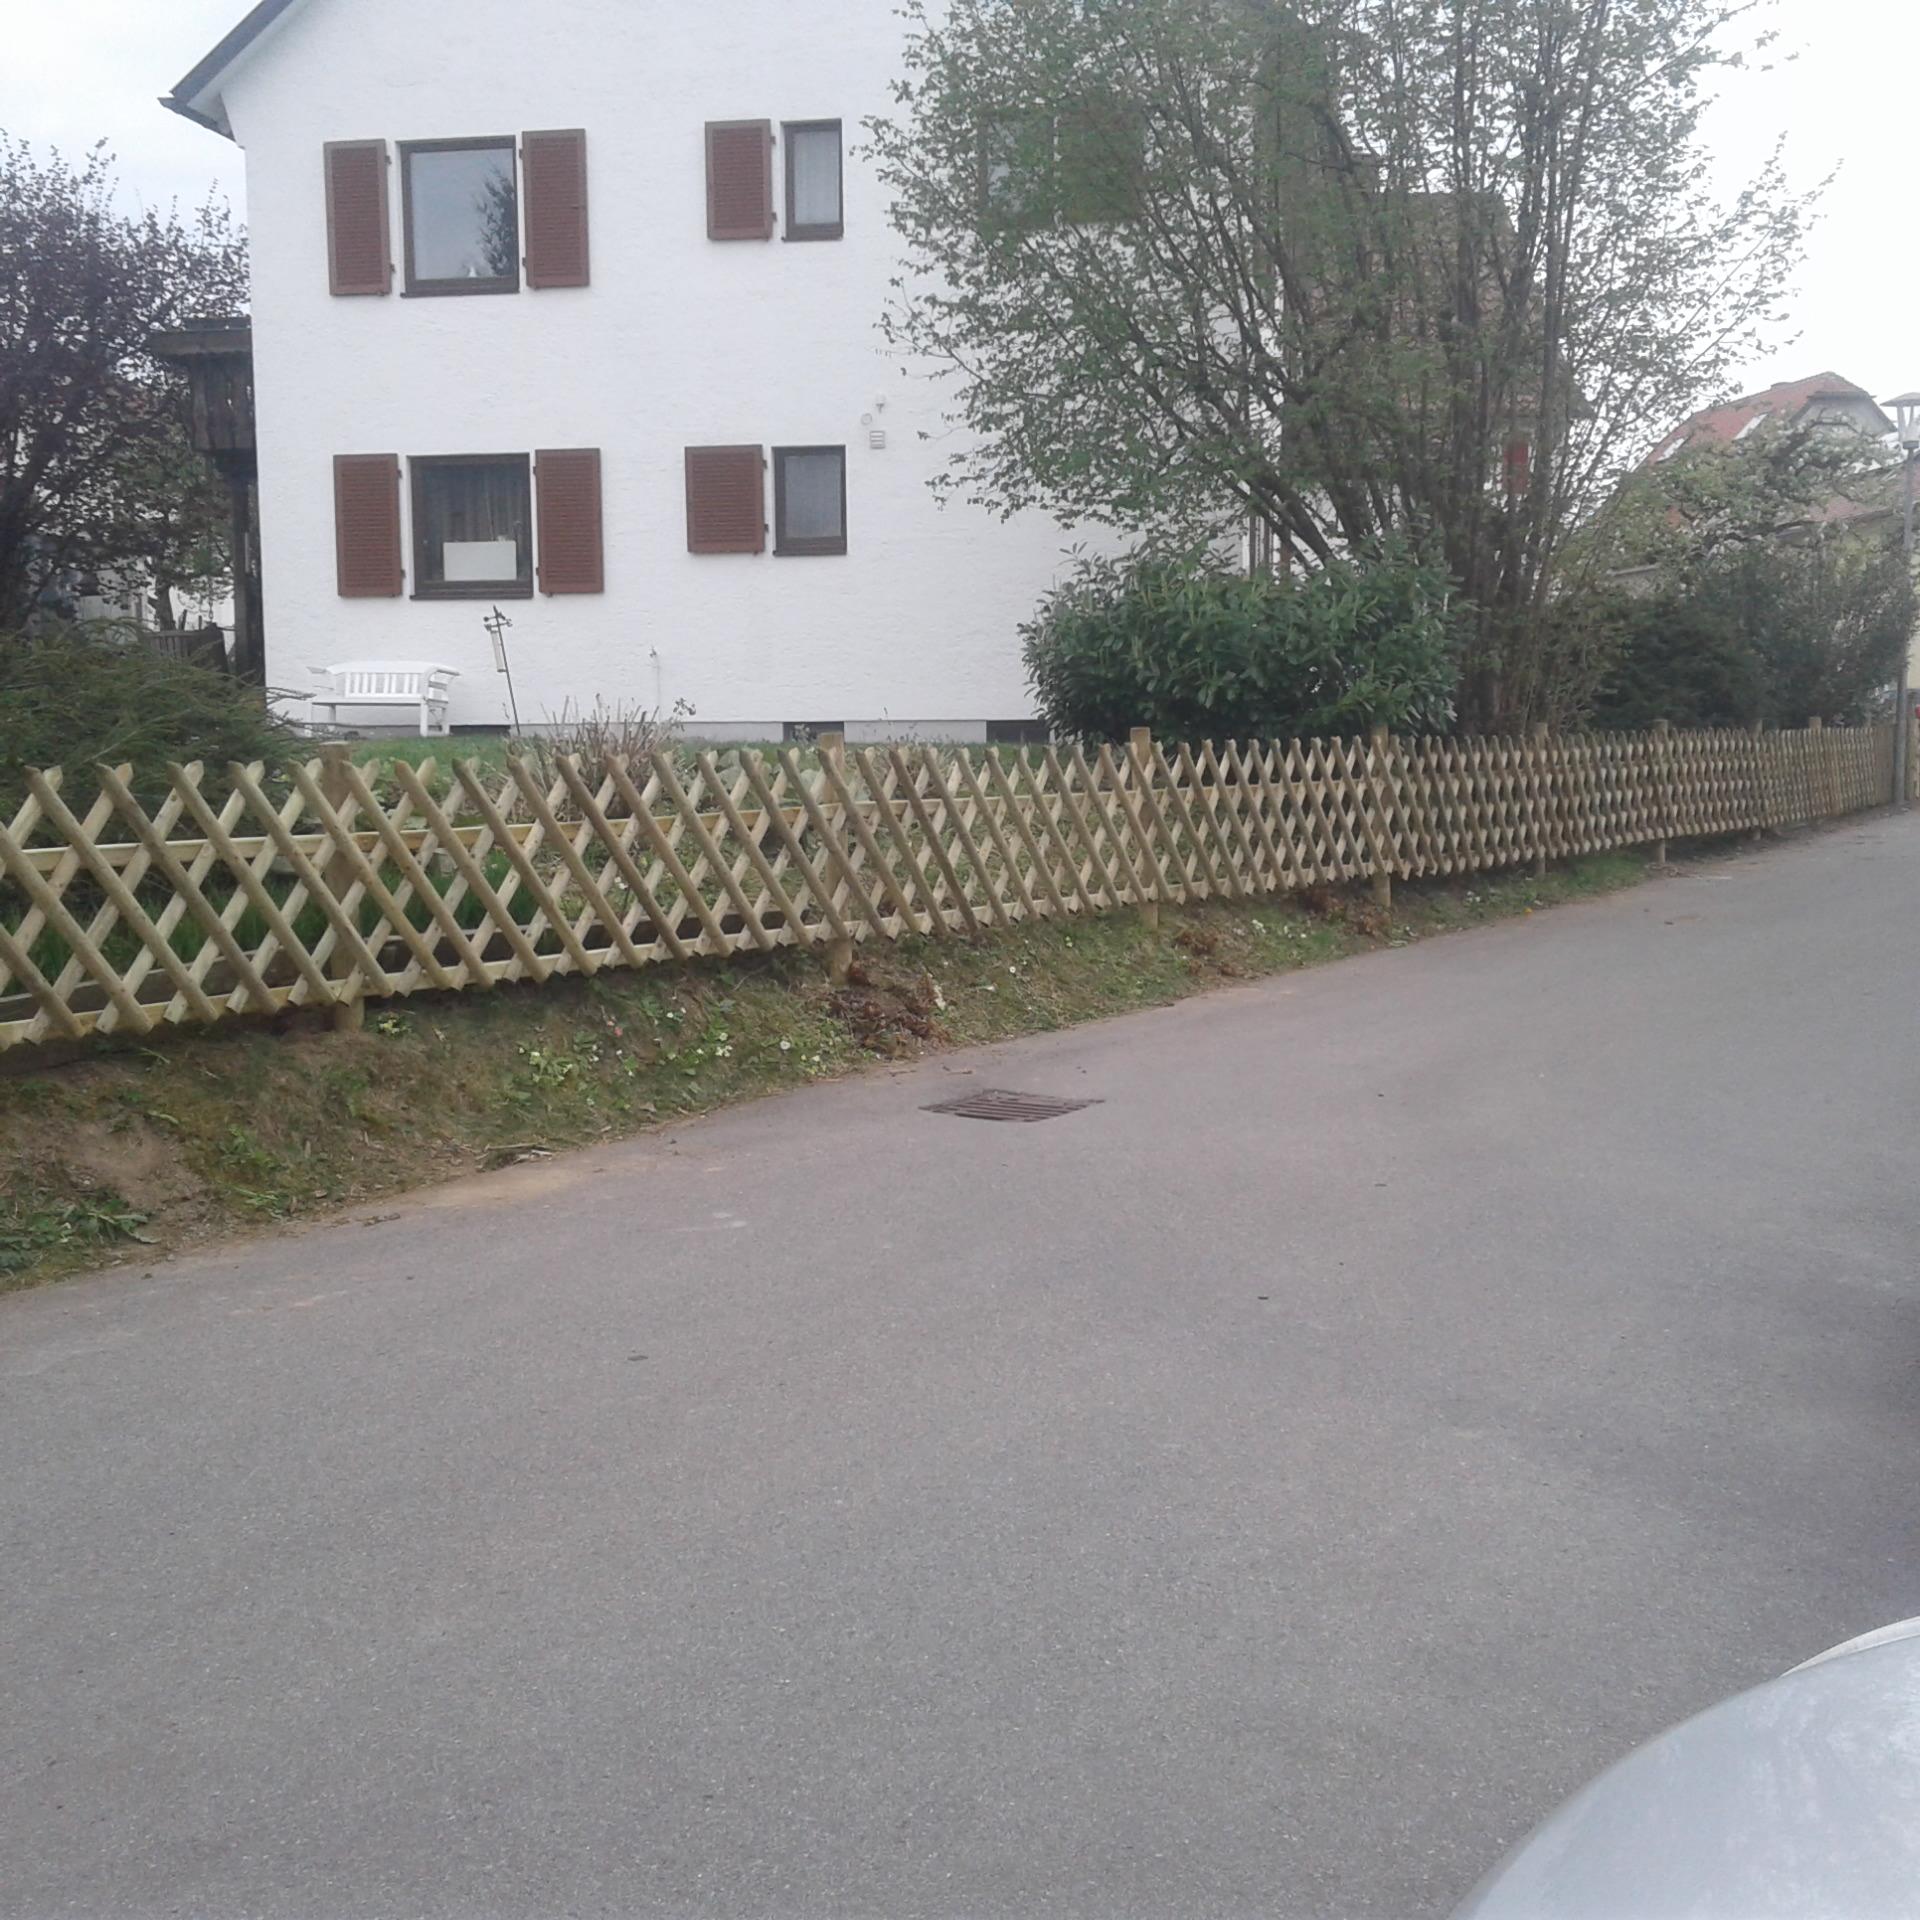 Jägerzaun in Wangen